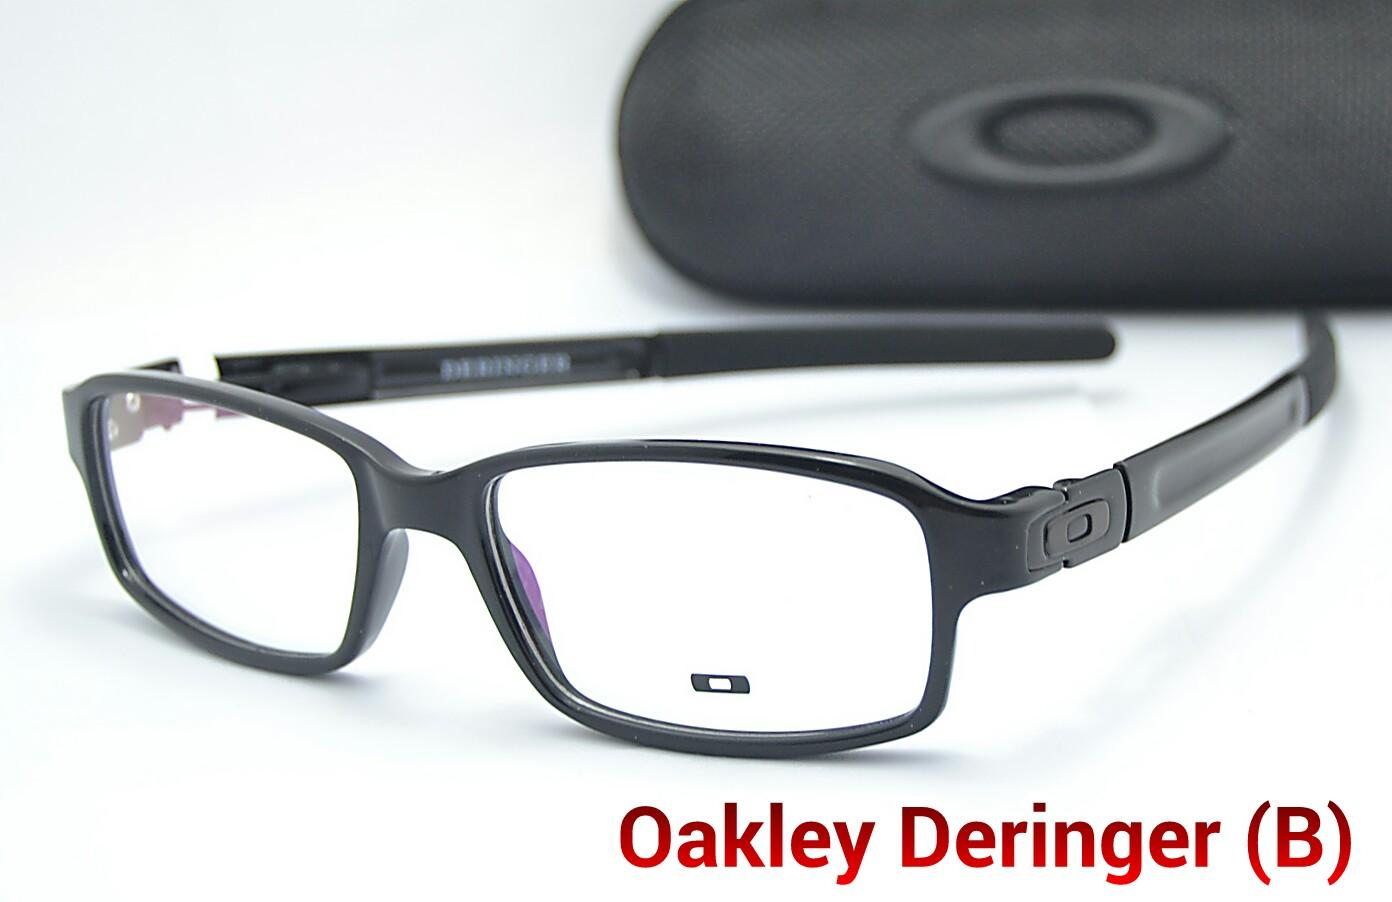 Deringer Oakley